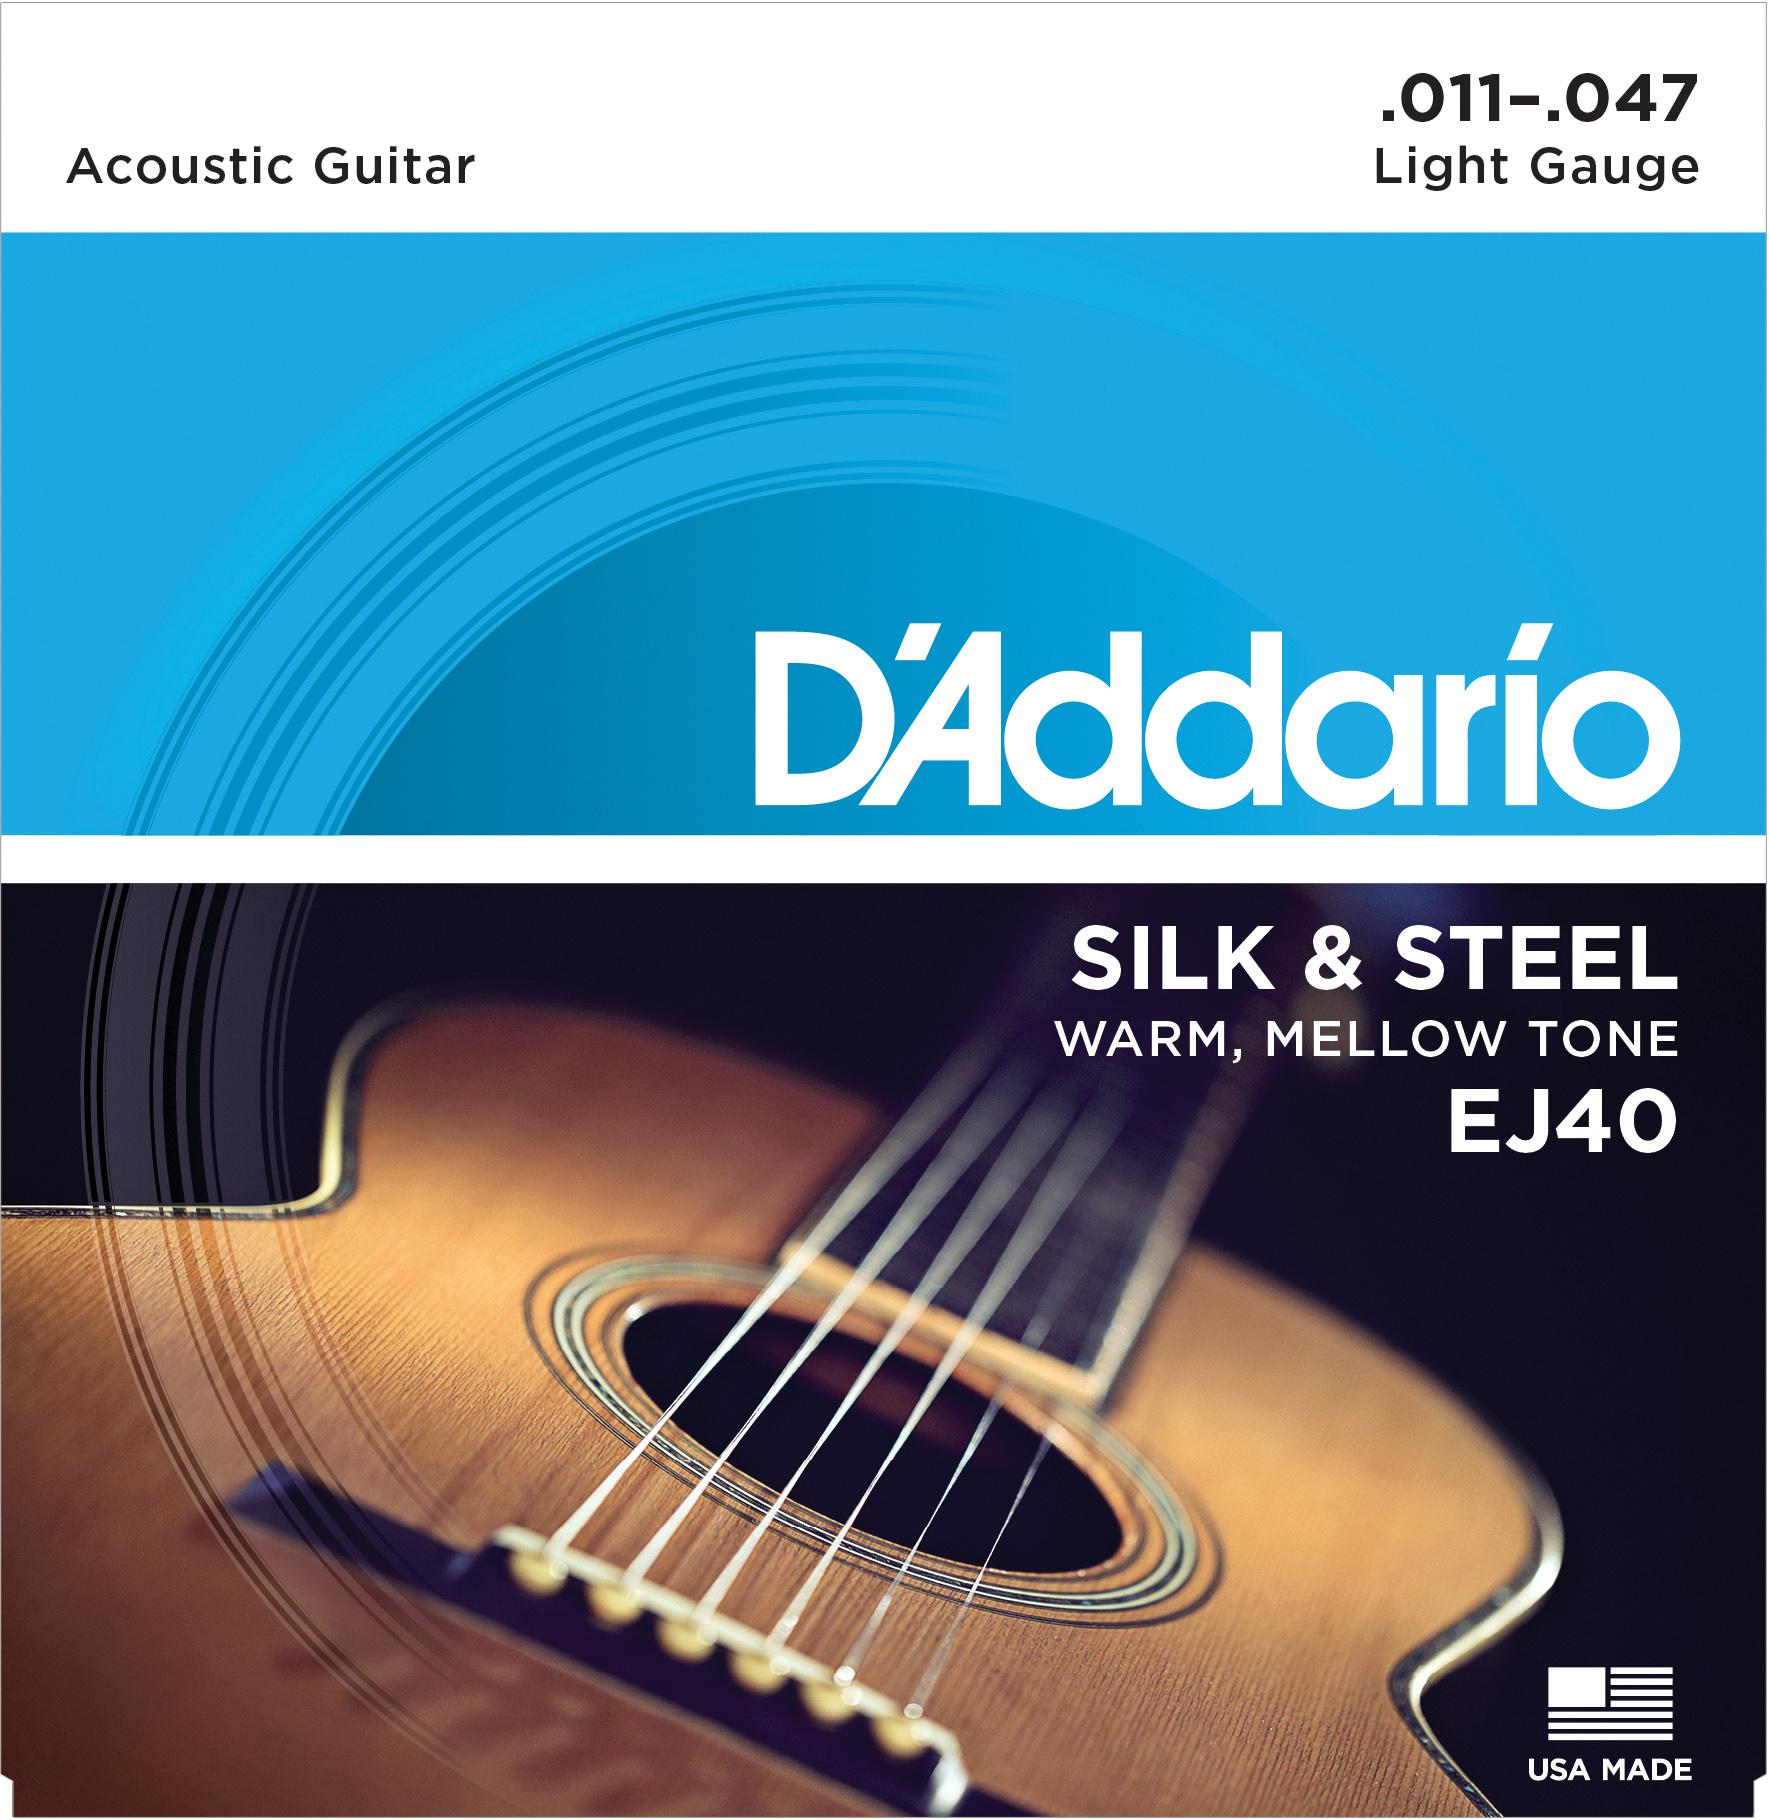 D'Addario Silk & Steel Folk EJ40 Acoustic Guitar Strings, Light, 11-47